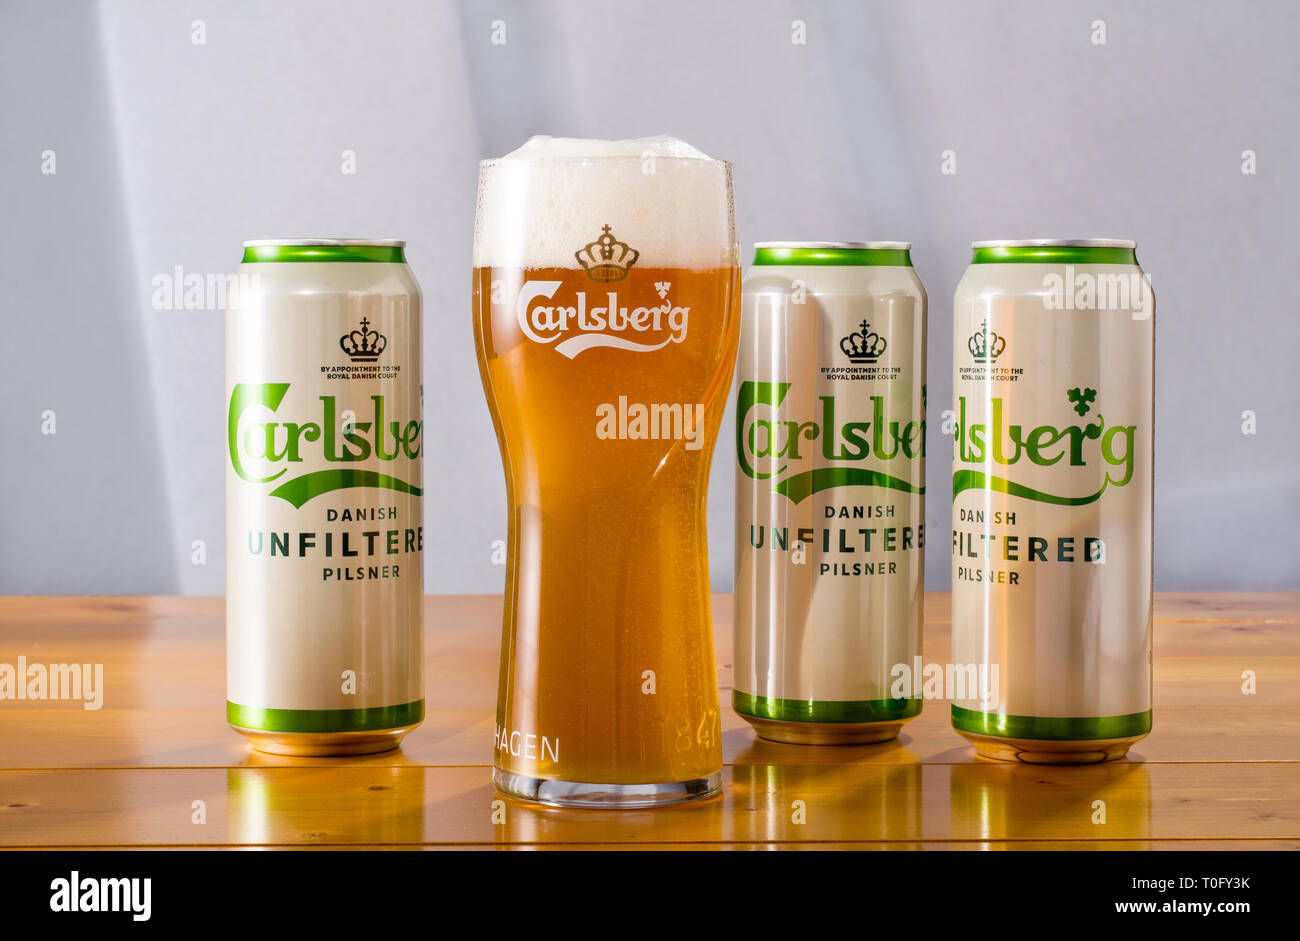 Carlsberg Unfiltered Pilsener beer in cans - Stock Image